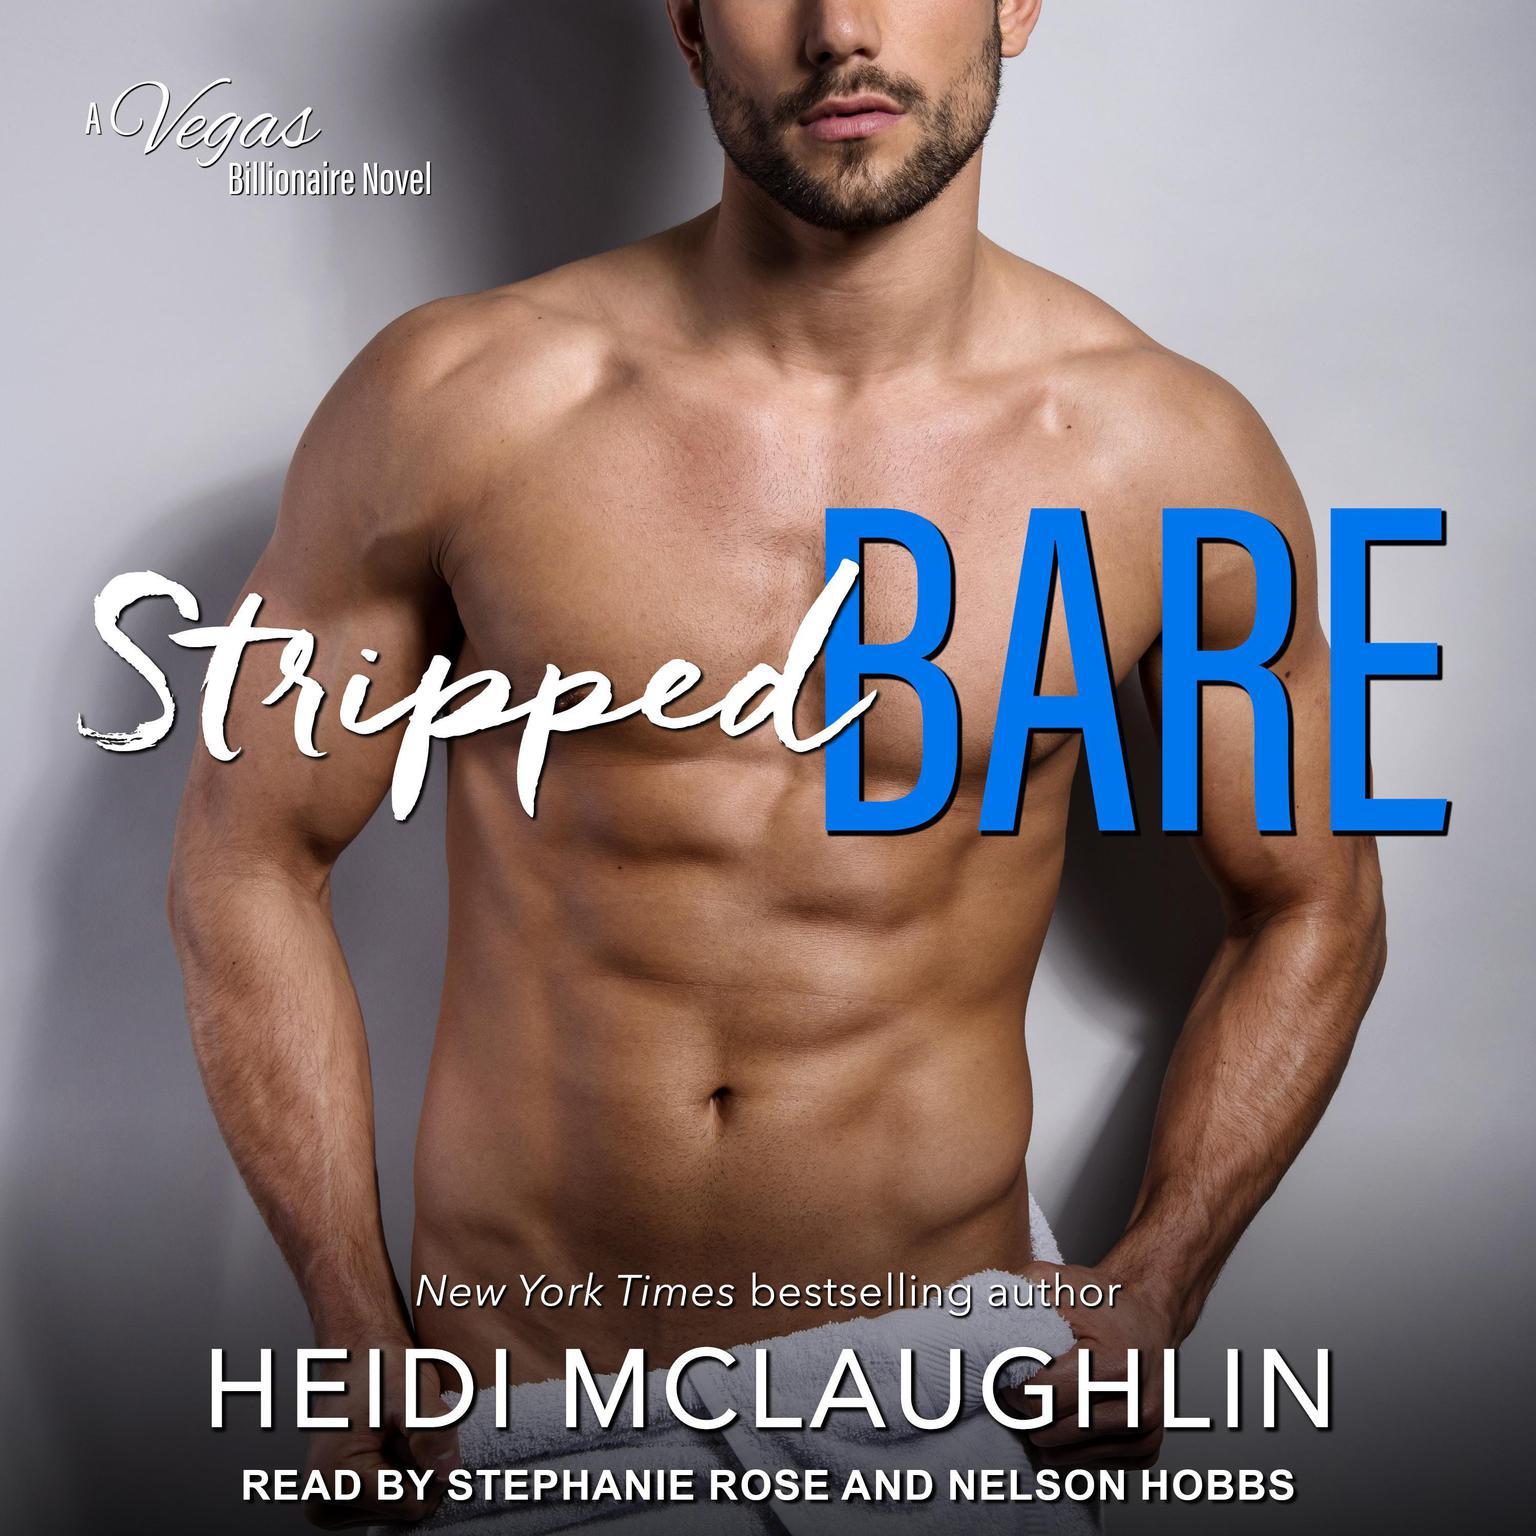 Stripped Bare: A Vegas Billionaire Novel Audiobook, by Heidi McLaughlin